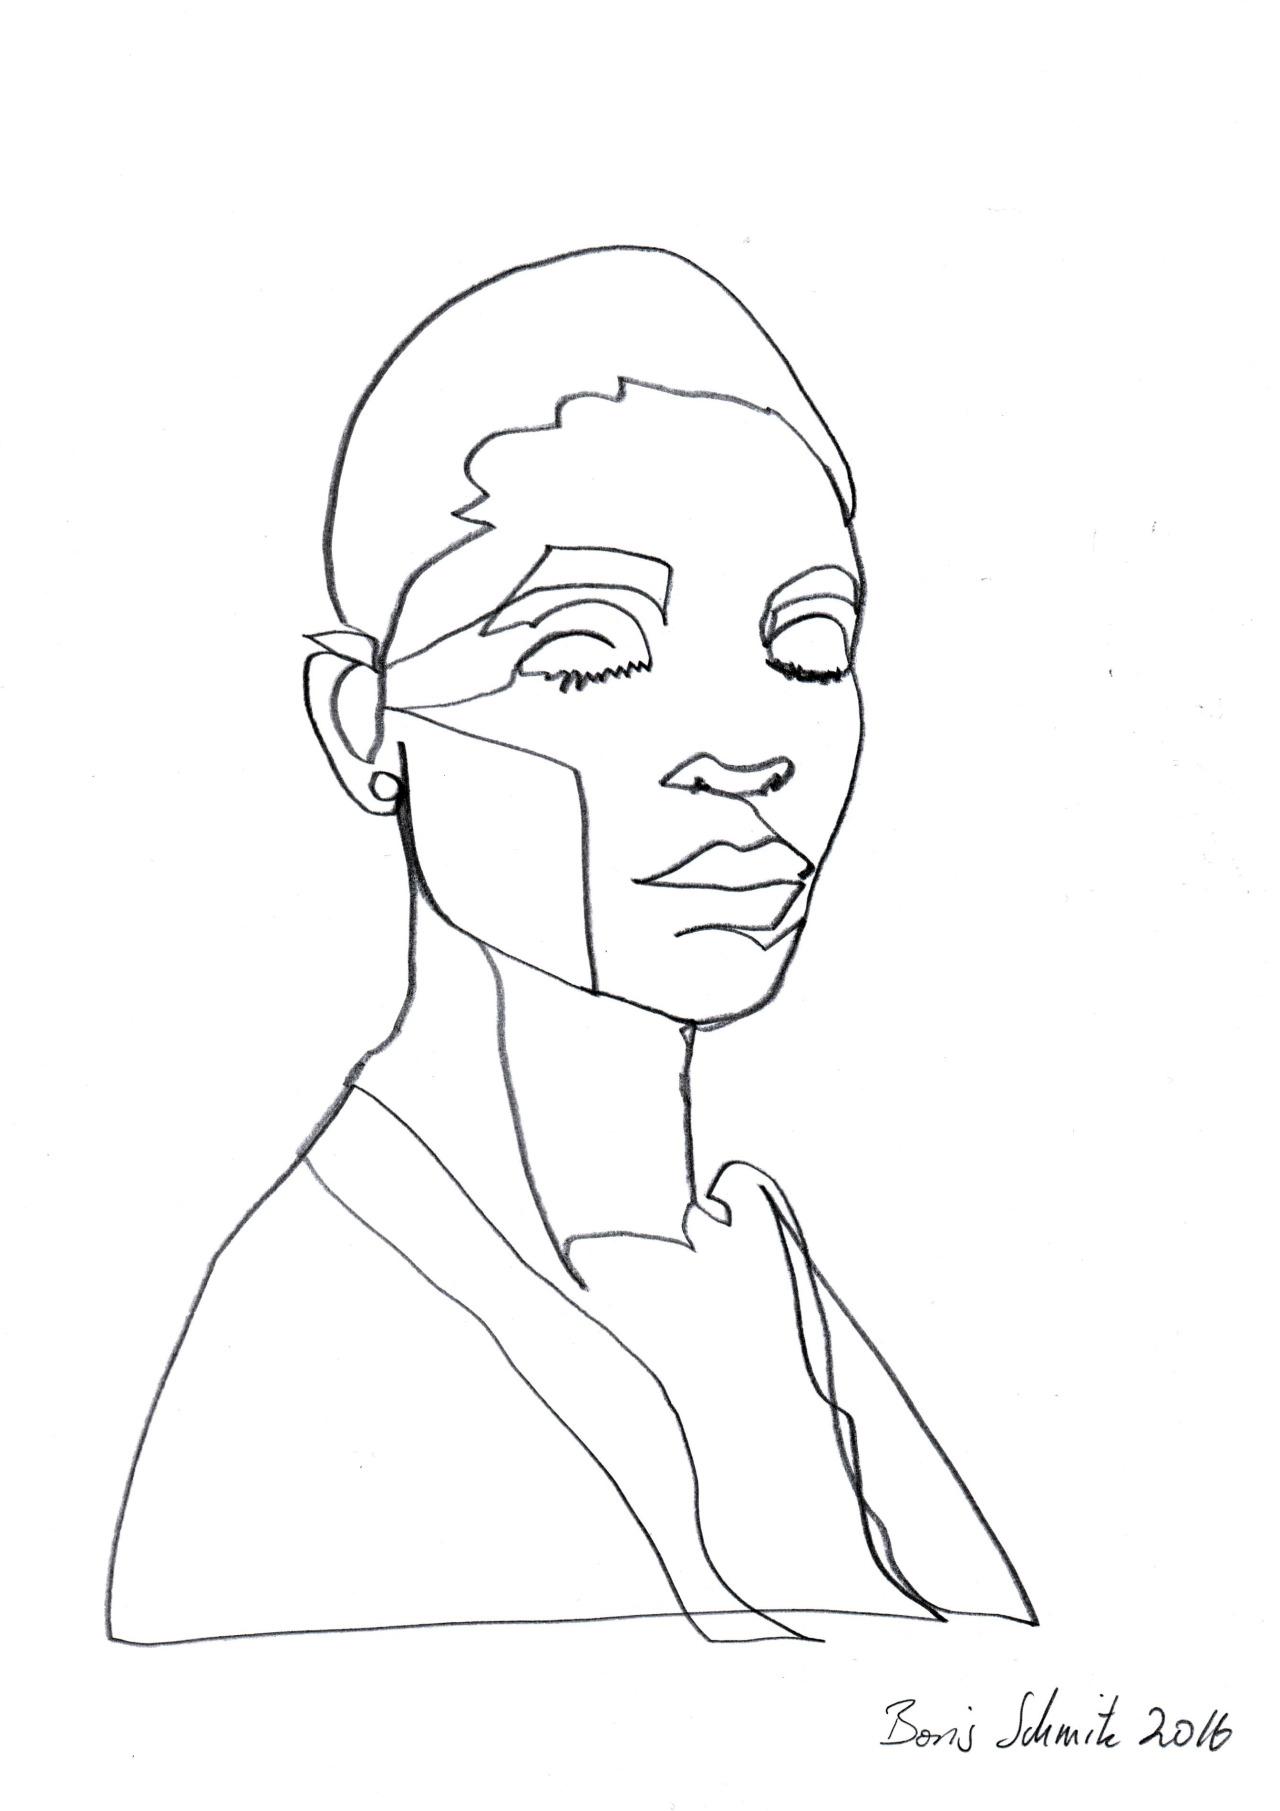 1280x1811 Gaze 456 Continuous Line Drawing By Boris Schmitz Illustrations